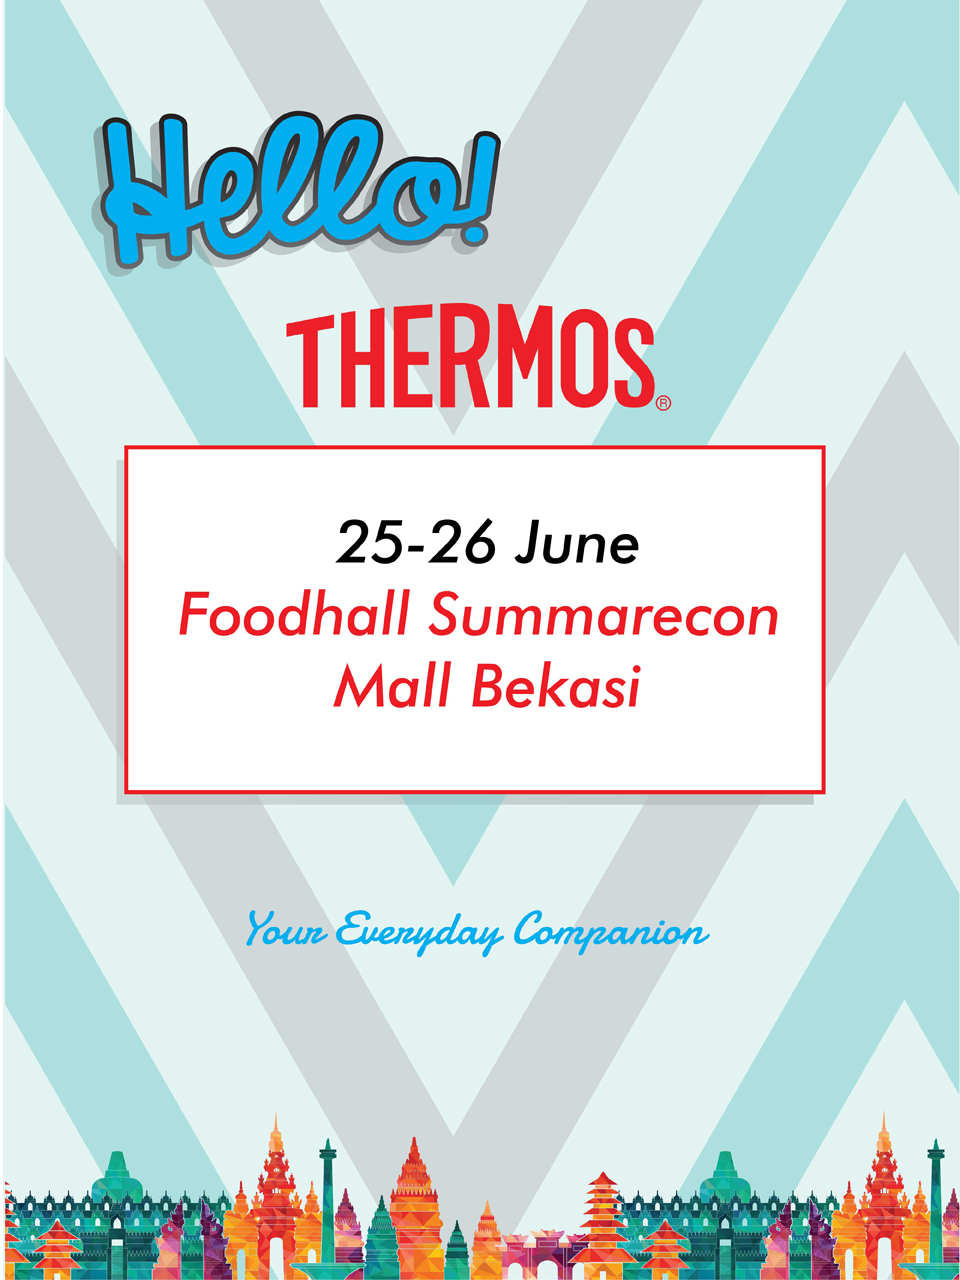 Foodhall Summarecon Mall Bekasi 25 - 26 Juni 2016